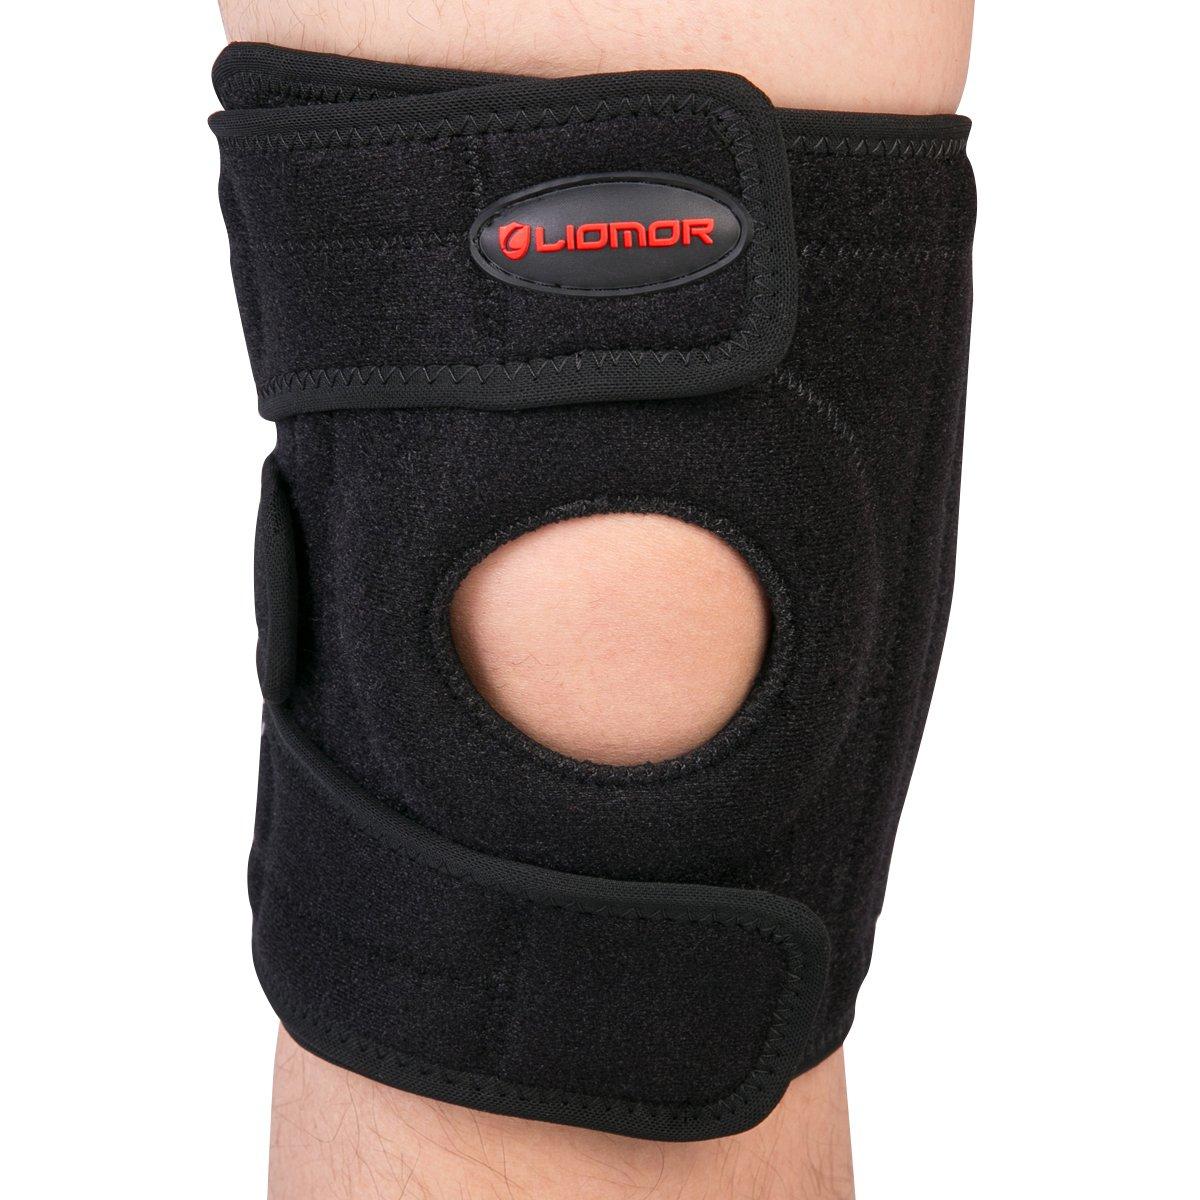 Liomor Knee Brace - Breathable Neoprene Knee Support for Running Adjustable Brace Meniscus Tear Fit Support with Open Patella Design